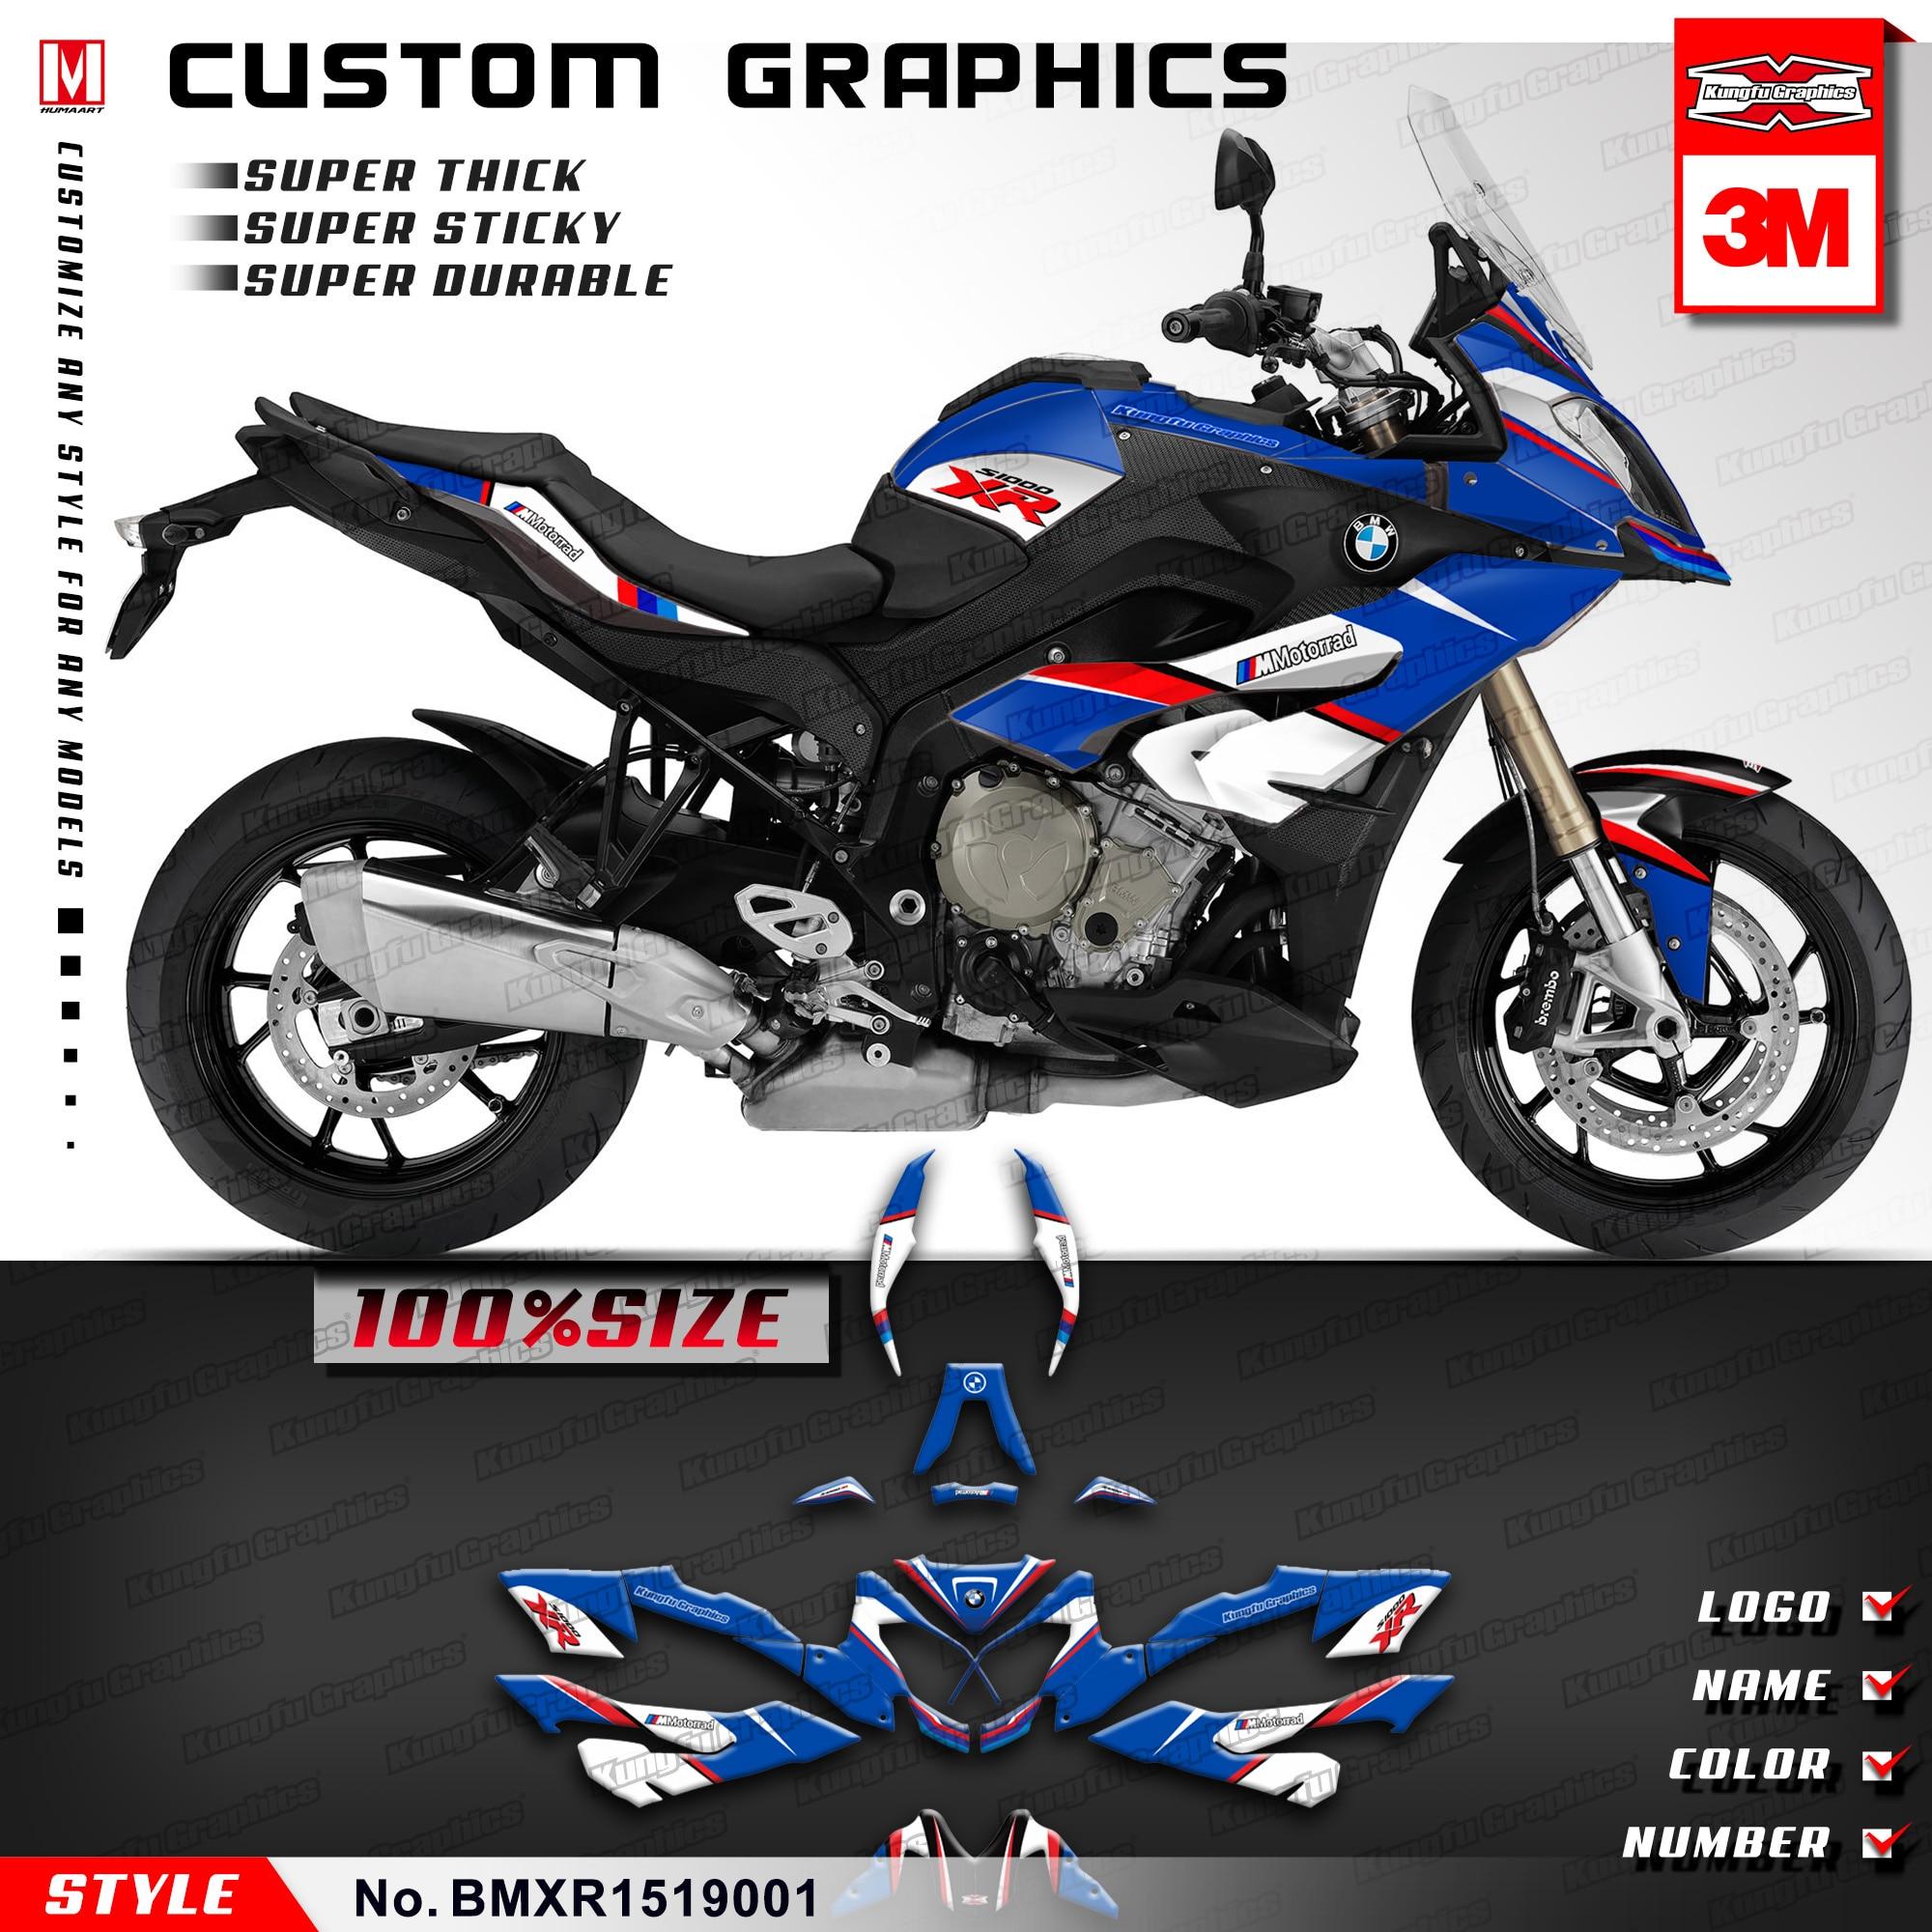 Kungfu graphics custom stickers kit vehicle wraps for bmw s